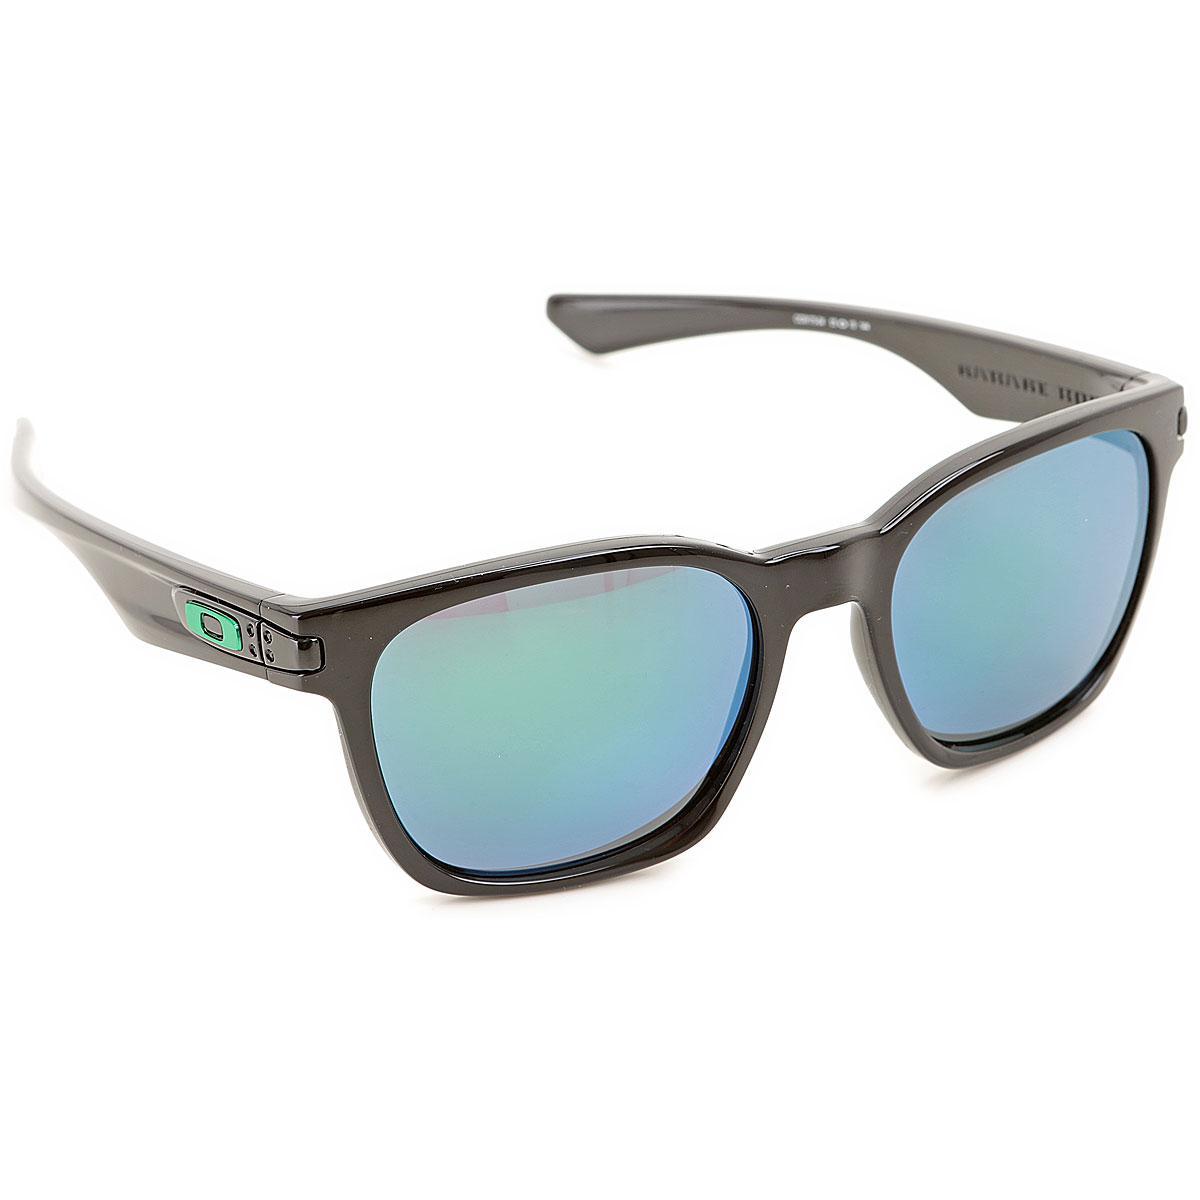 Lyst - Oakley Sunglasses for Men